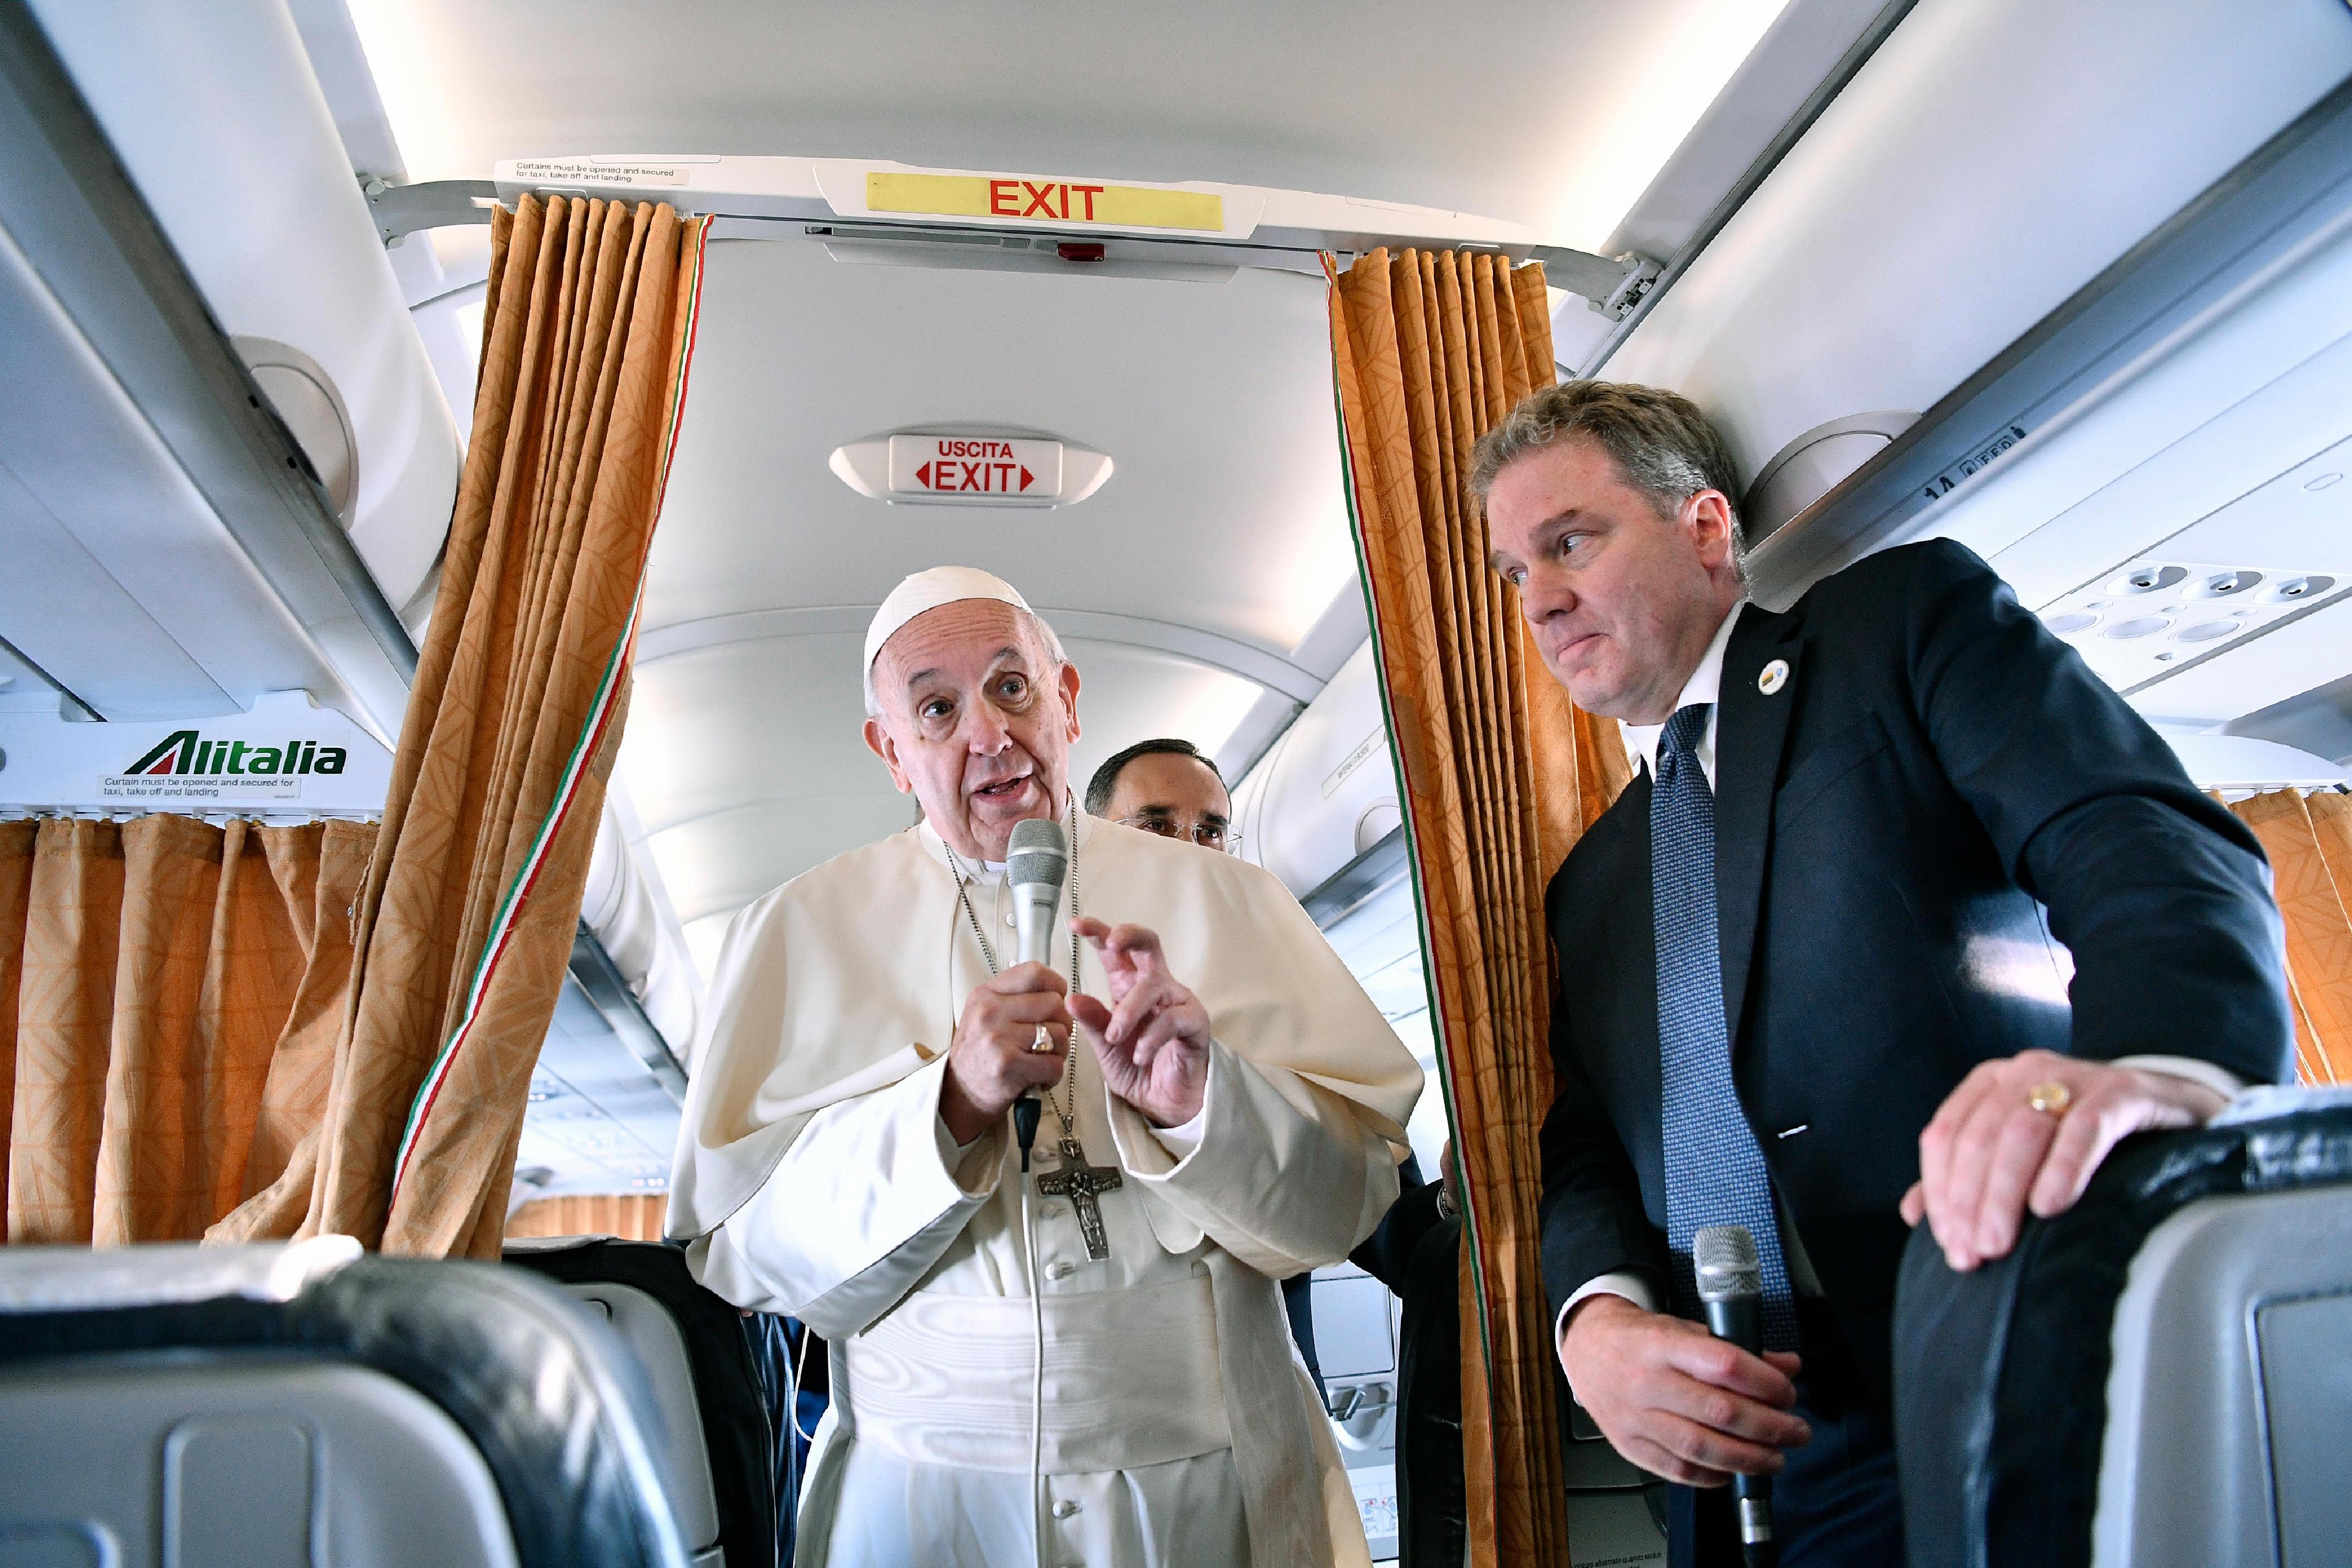 Francisco habló sobre el acuerdo en el vuelo Roma-Vilna (Lituania) © Vatican Media